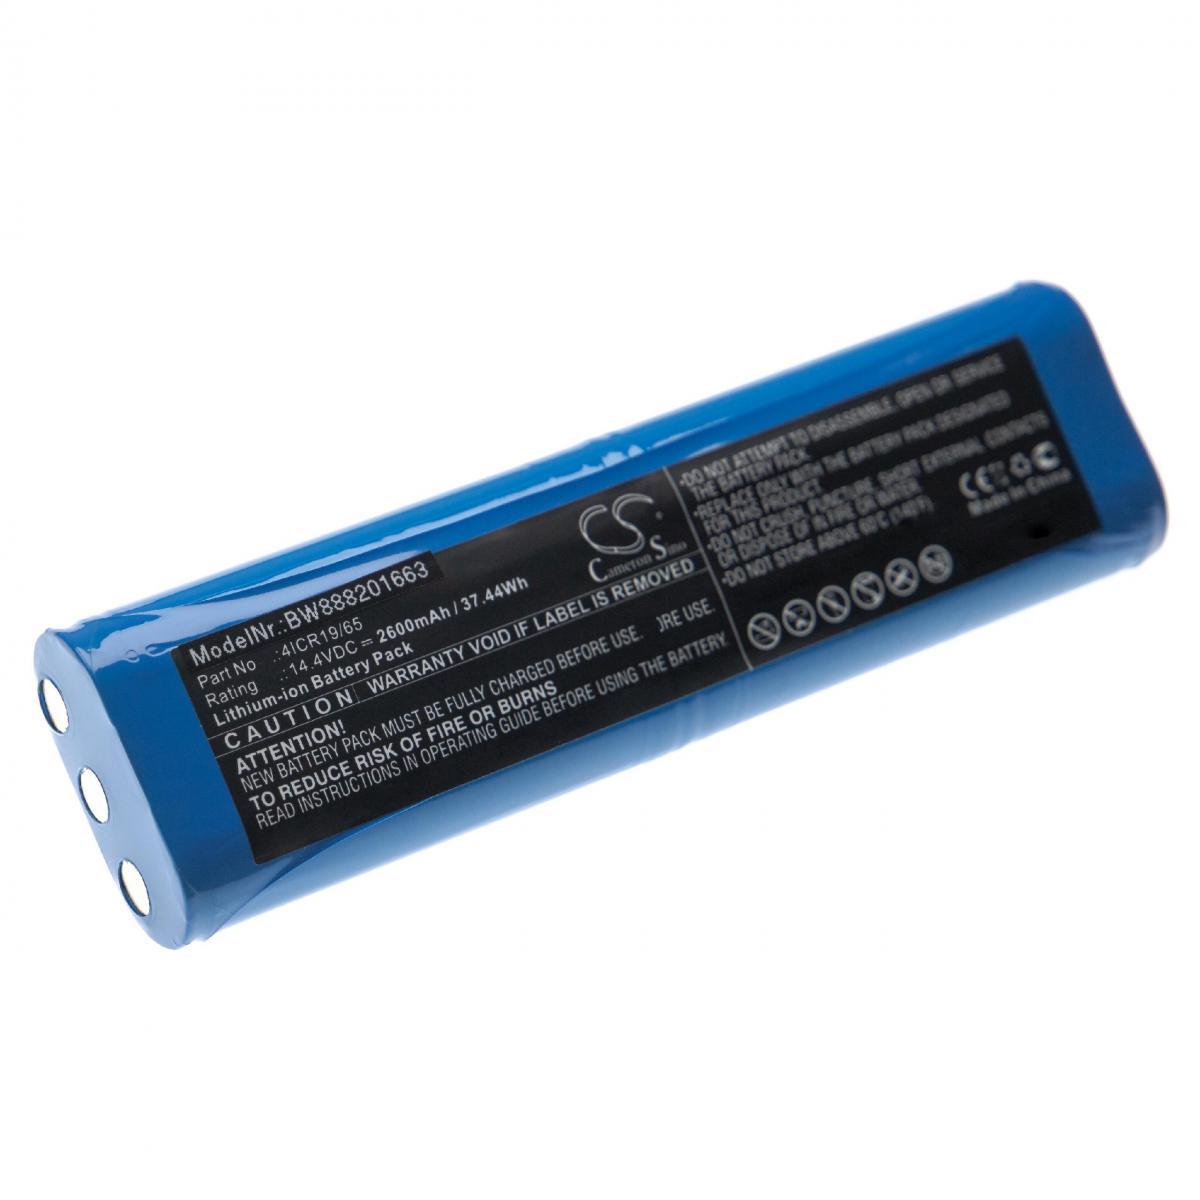 Vhbw vhbw batterie compatible avec Philips FC8810, FC8820, FC8830, FC8832 aspirateur Home Cleaner (2600mAh, 14,4V, Li-Ion)